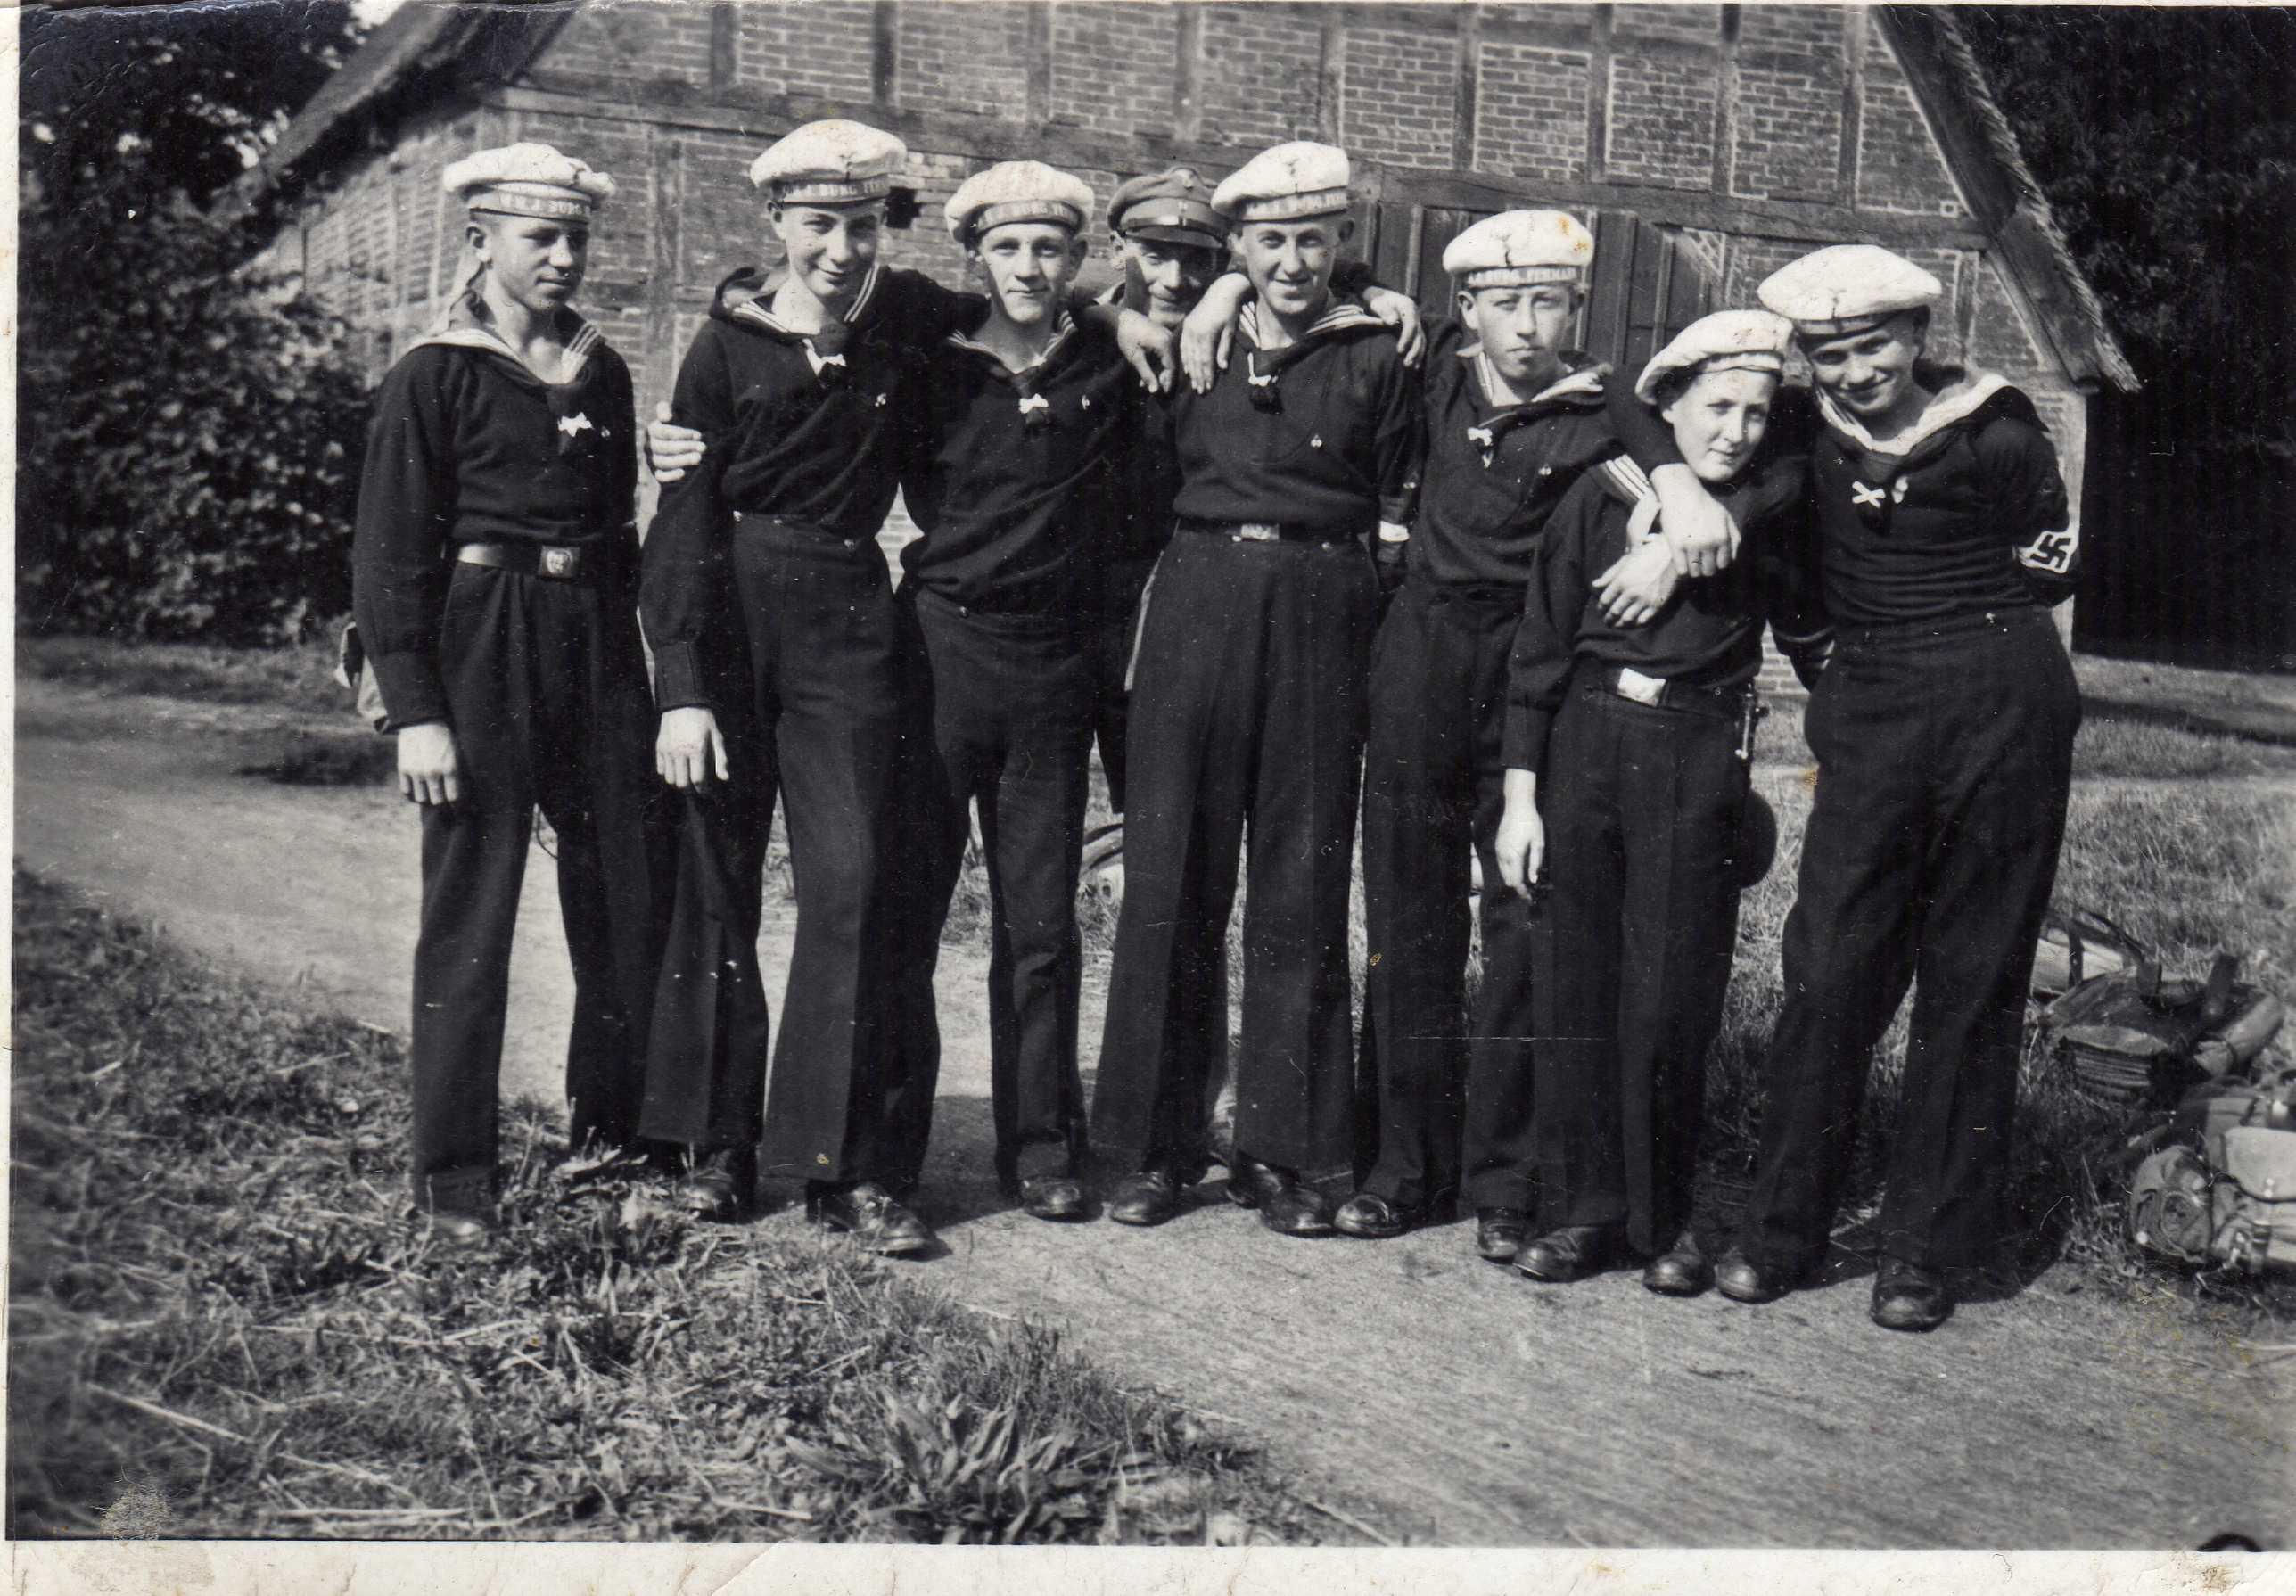 Hj Naval Marine Hj Cap Tallies Germany Third Reich